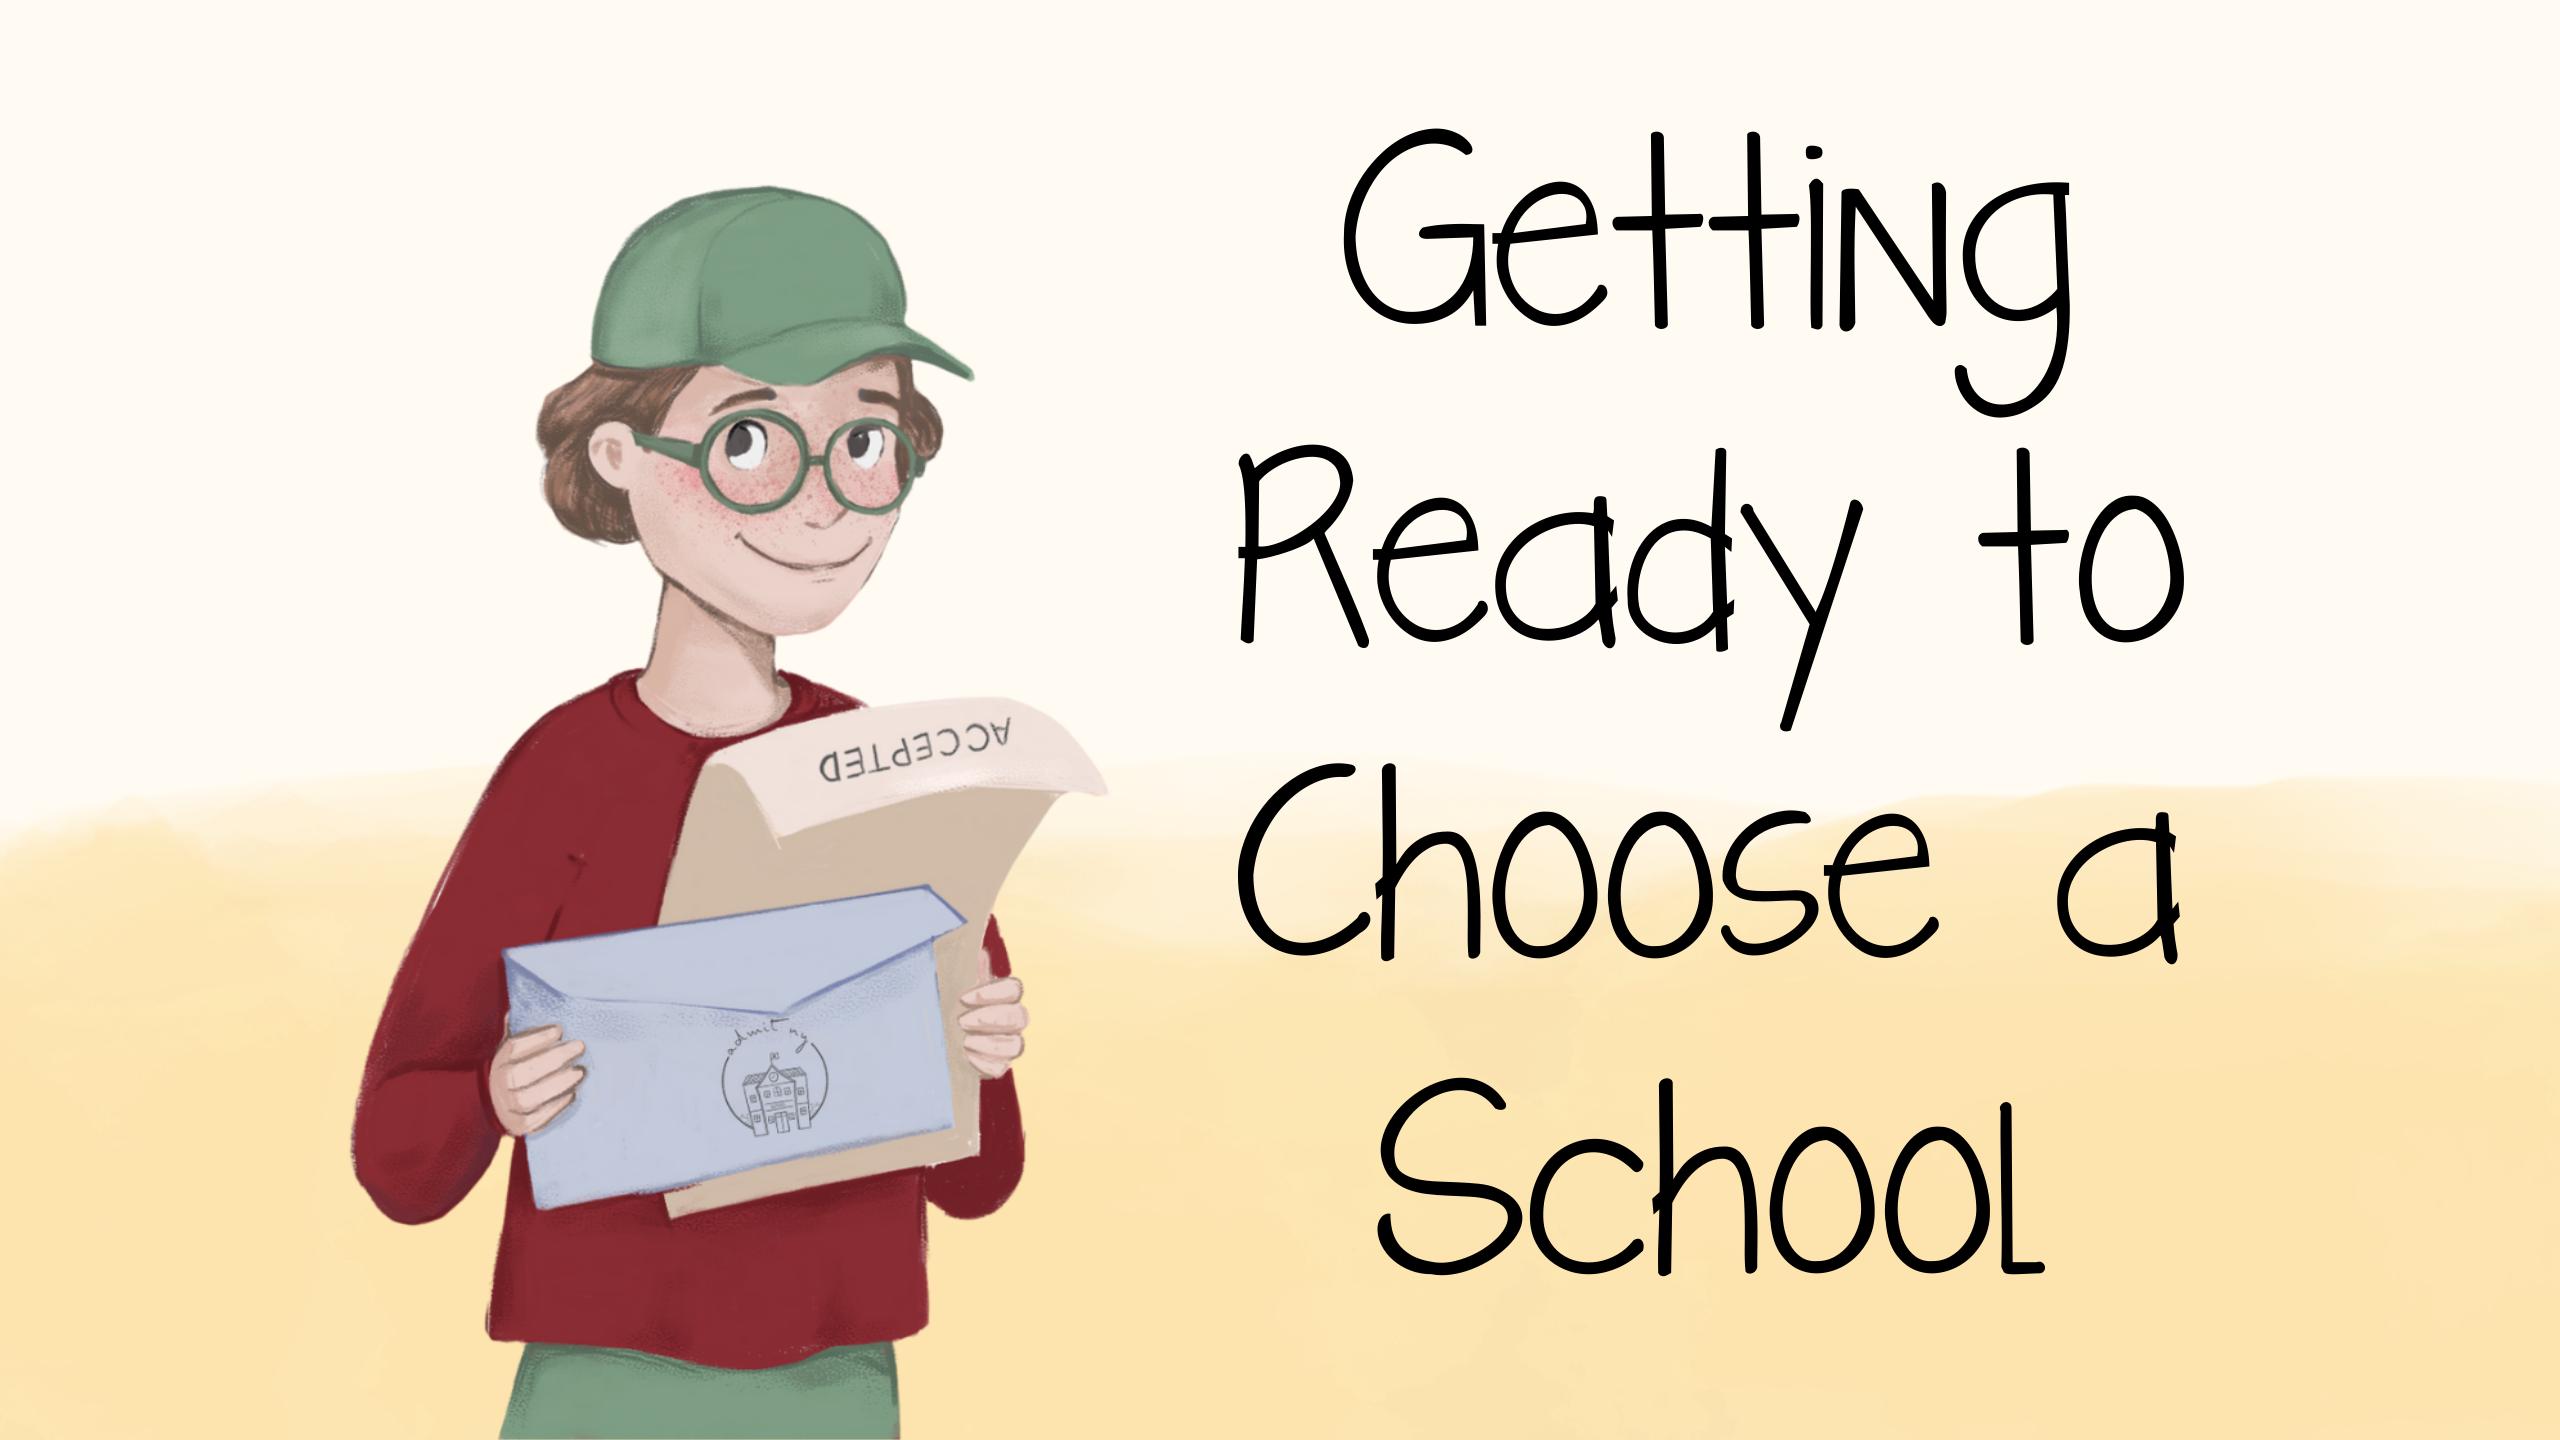 Getting Ready to Choose a School